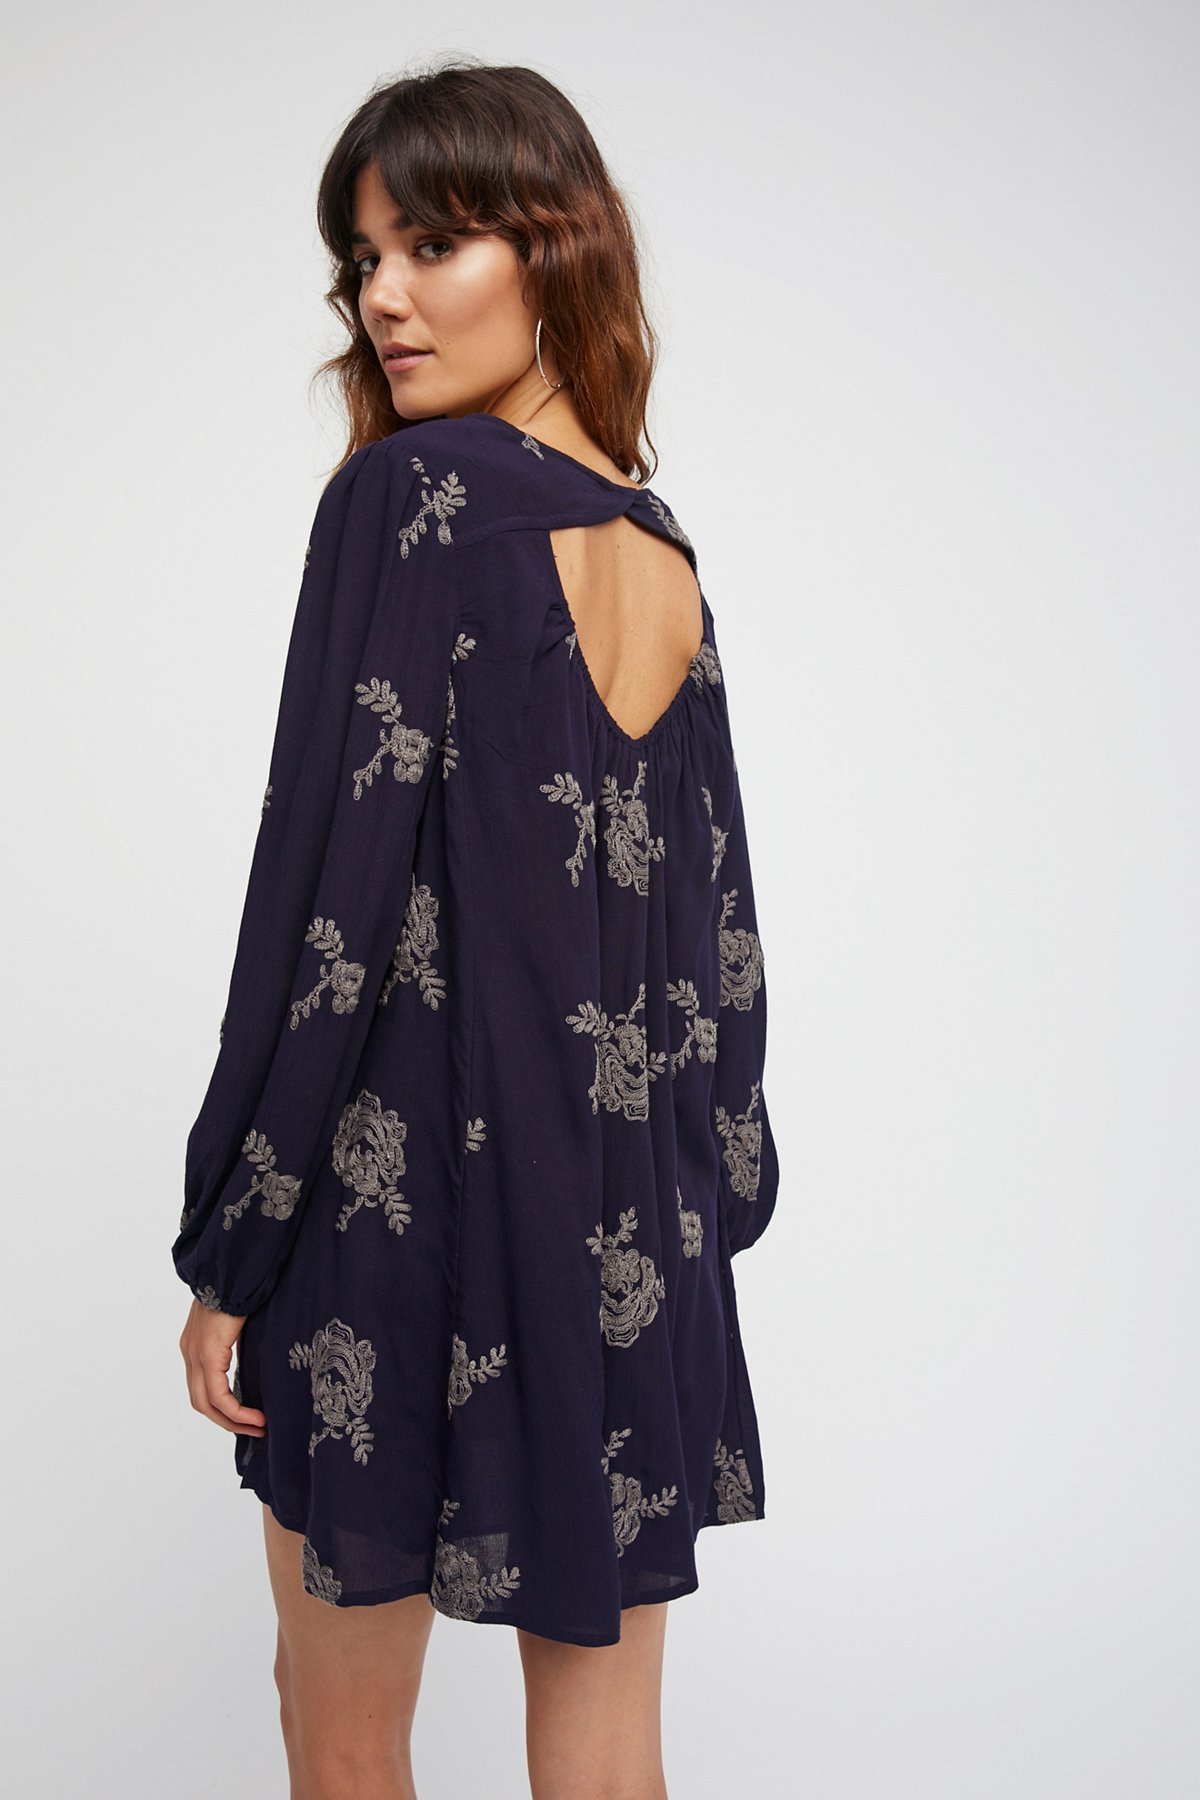 Embroidered Austin Dress